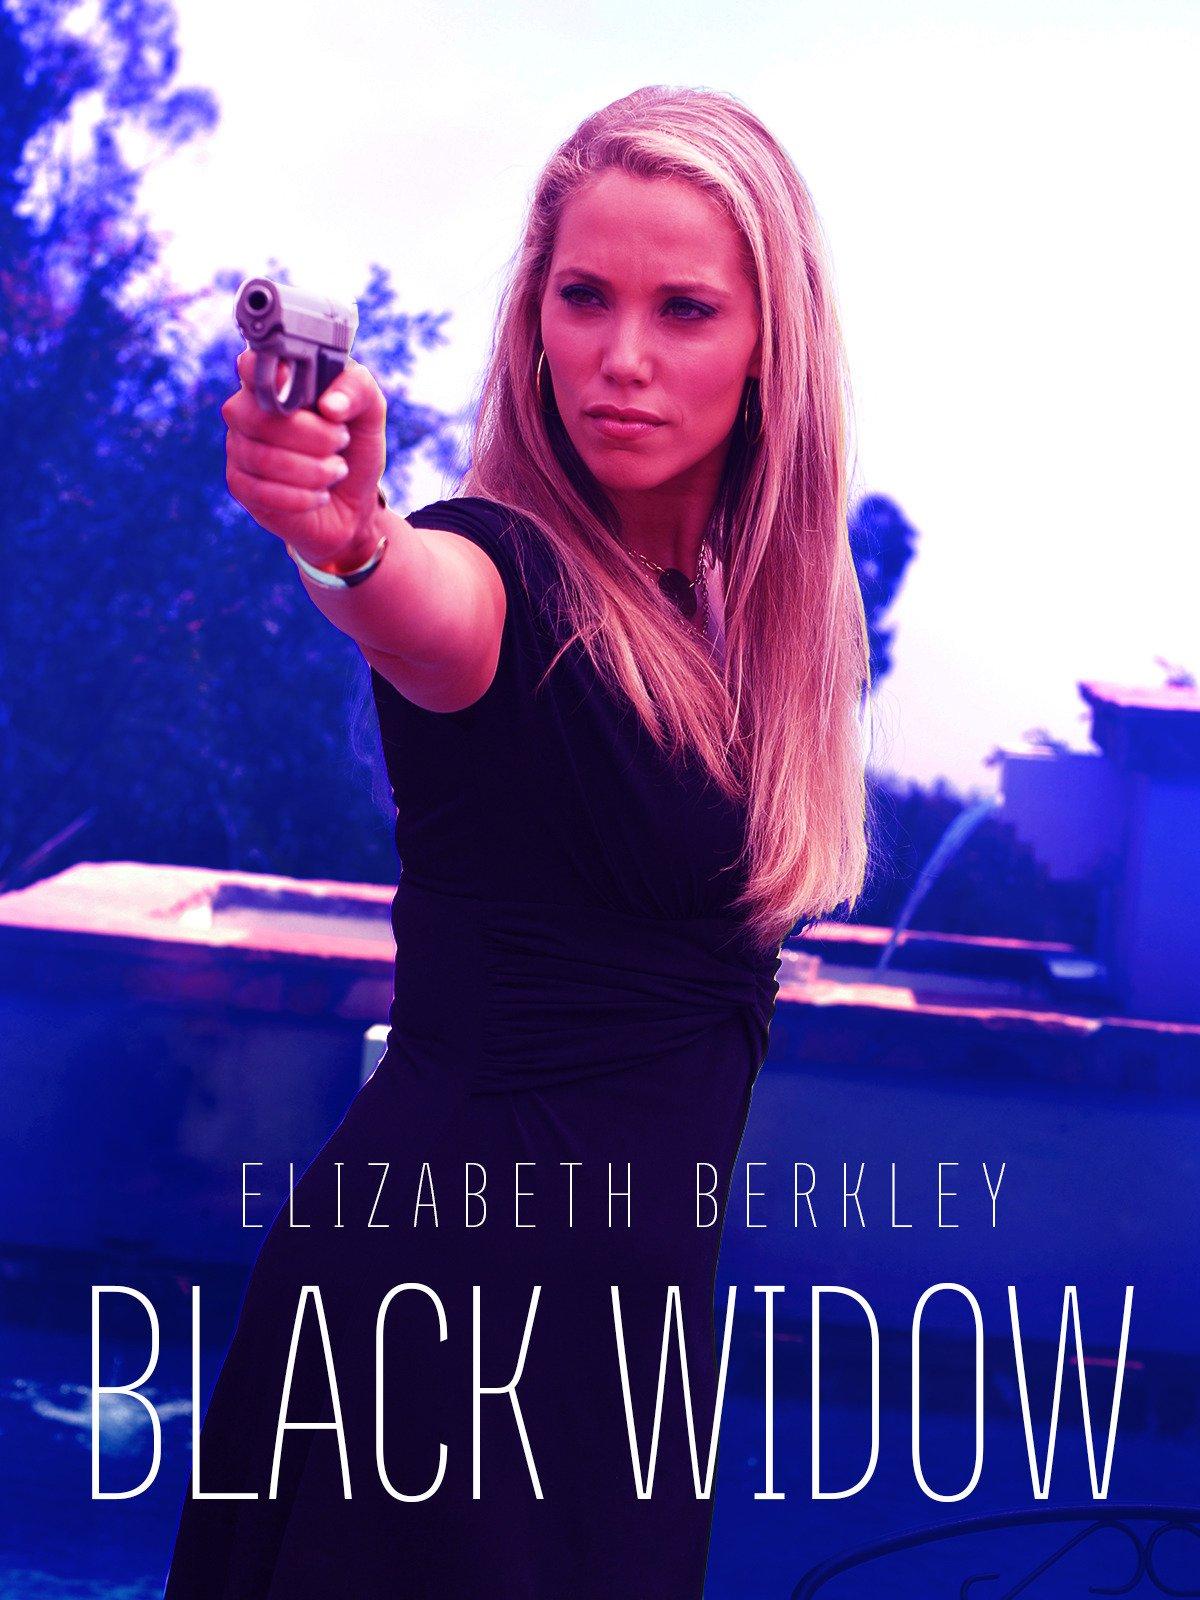 Elizabeth berkley showgirls kick